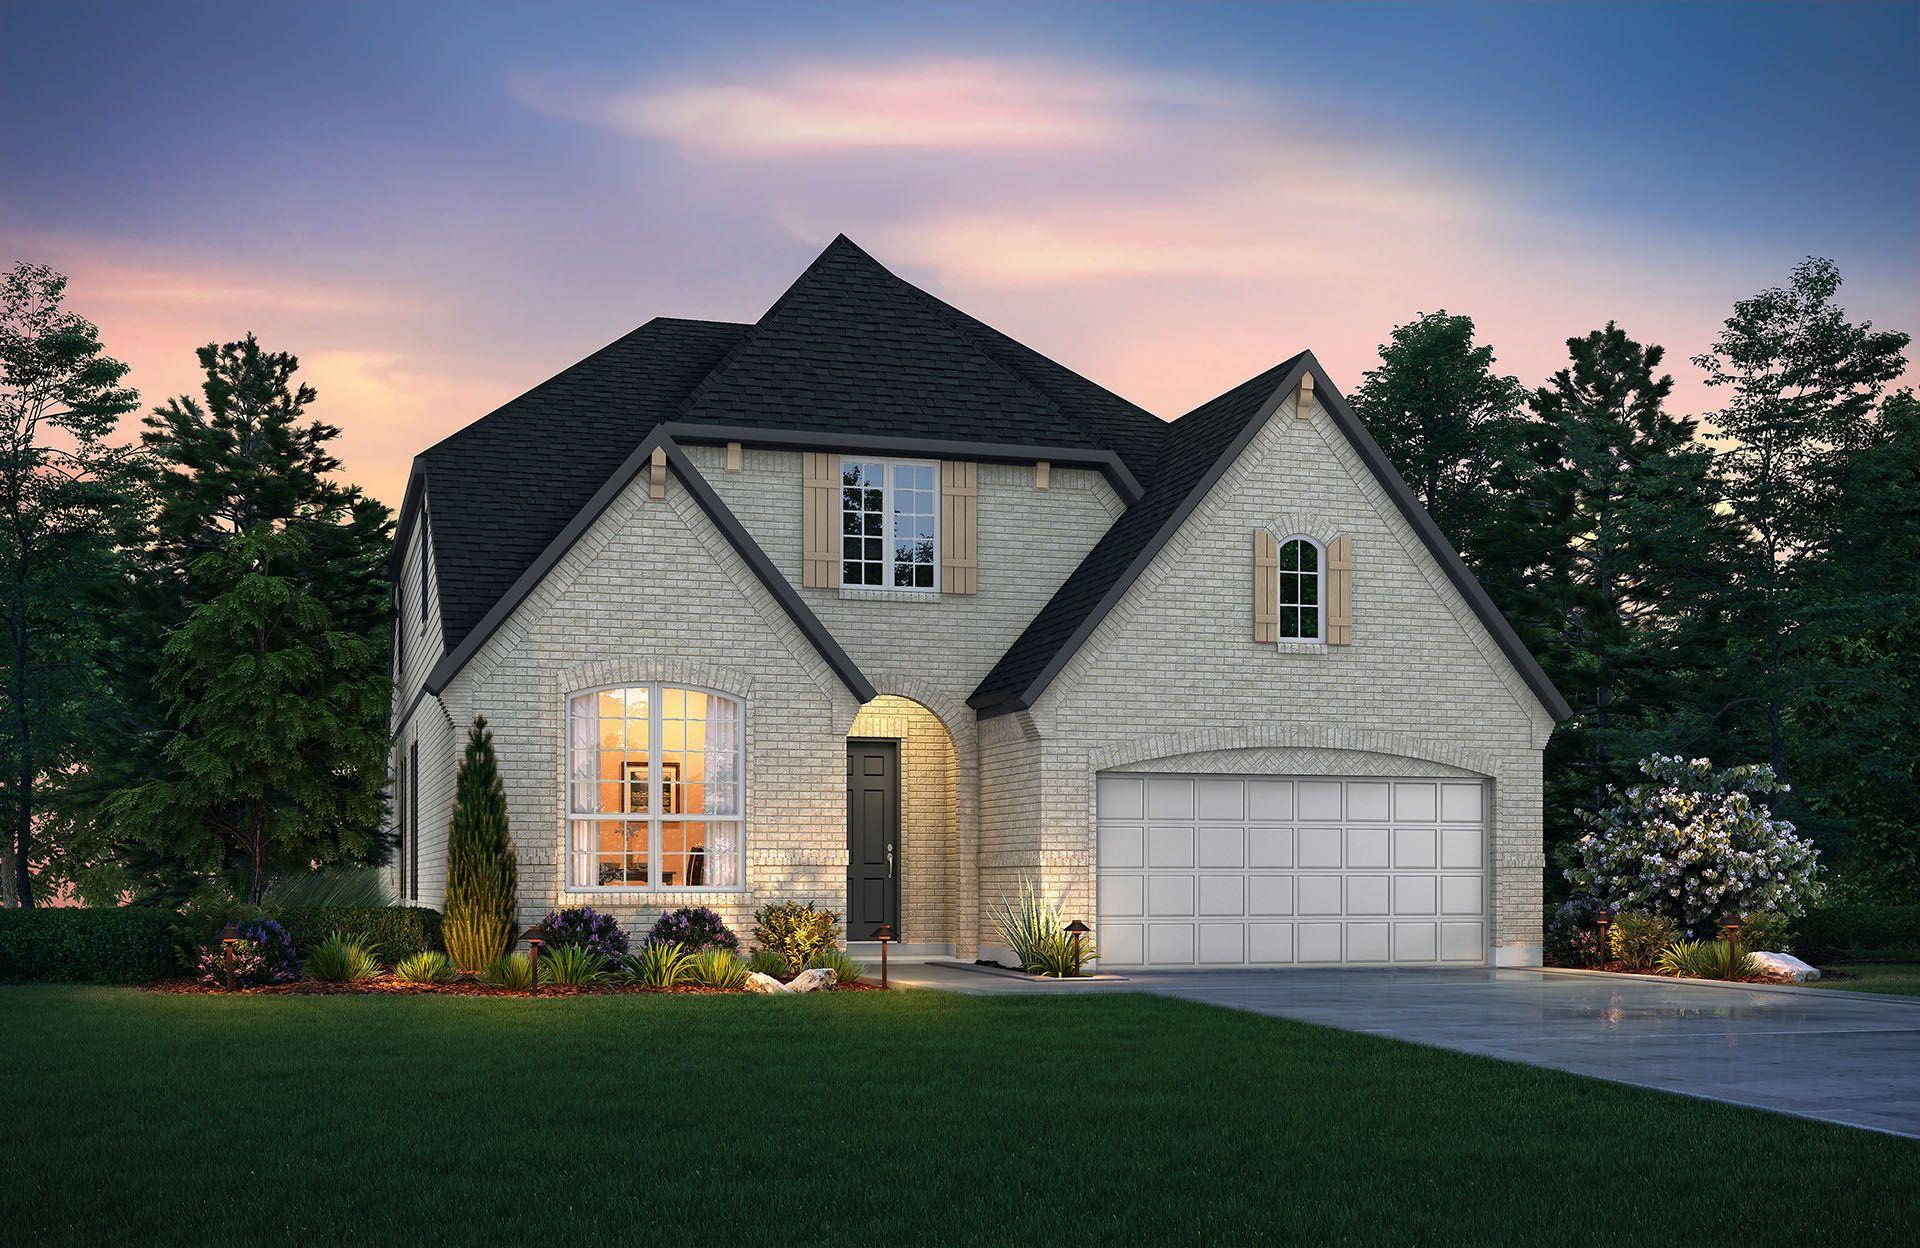 Roanoke homes for sale homes for sale in roanoke tx for Home builders roanoke va